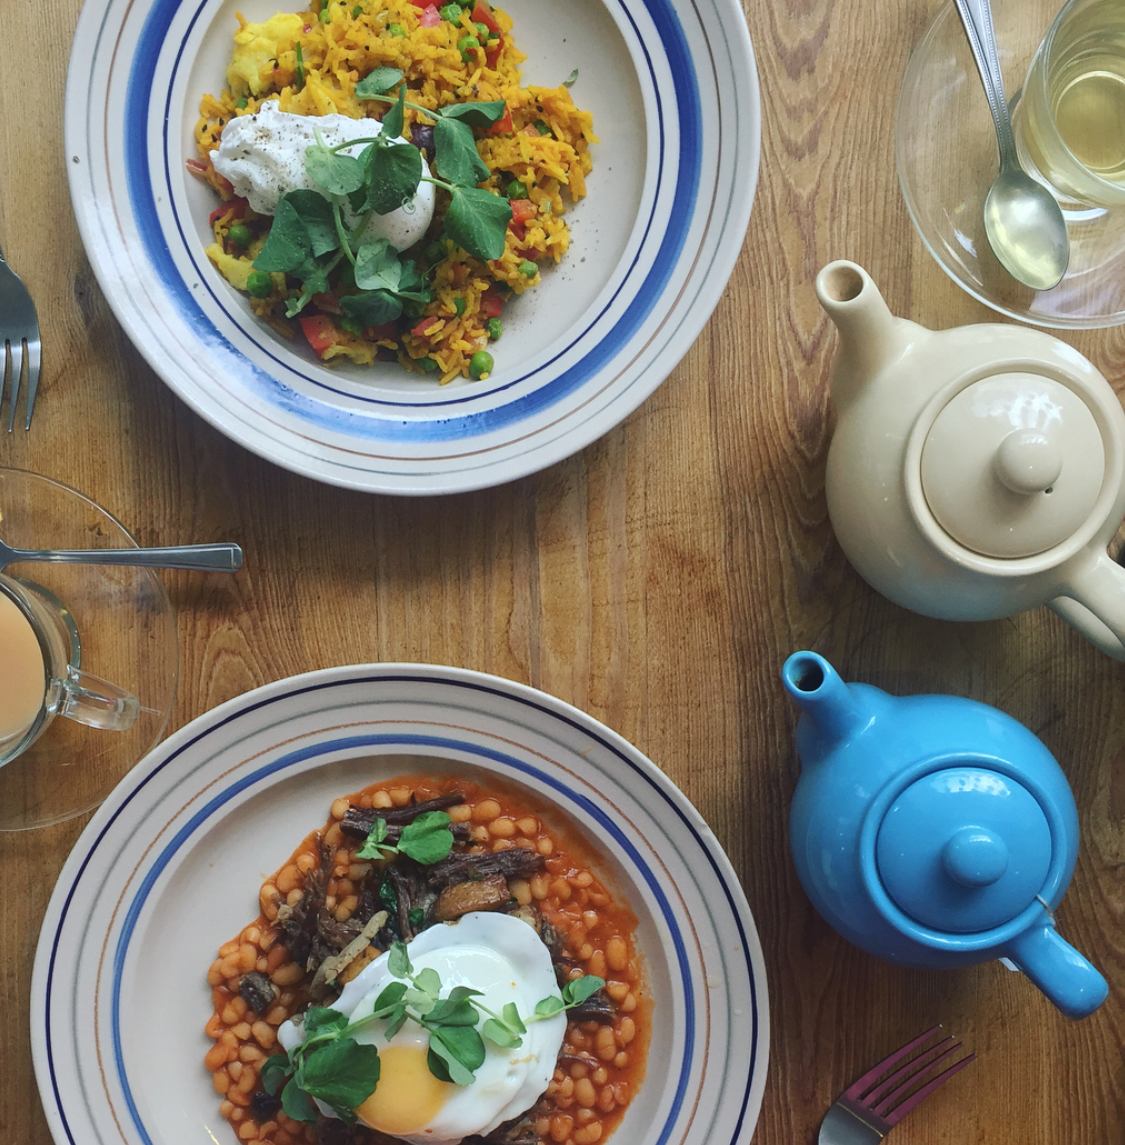 egg & spoon brighton tabletop view